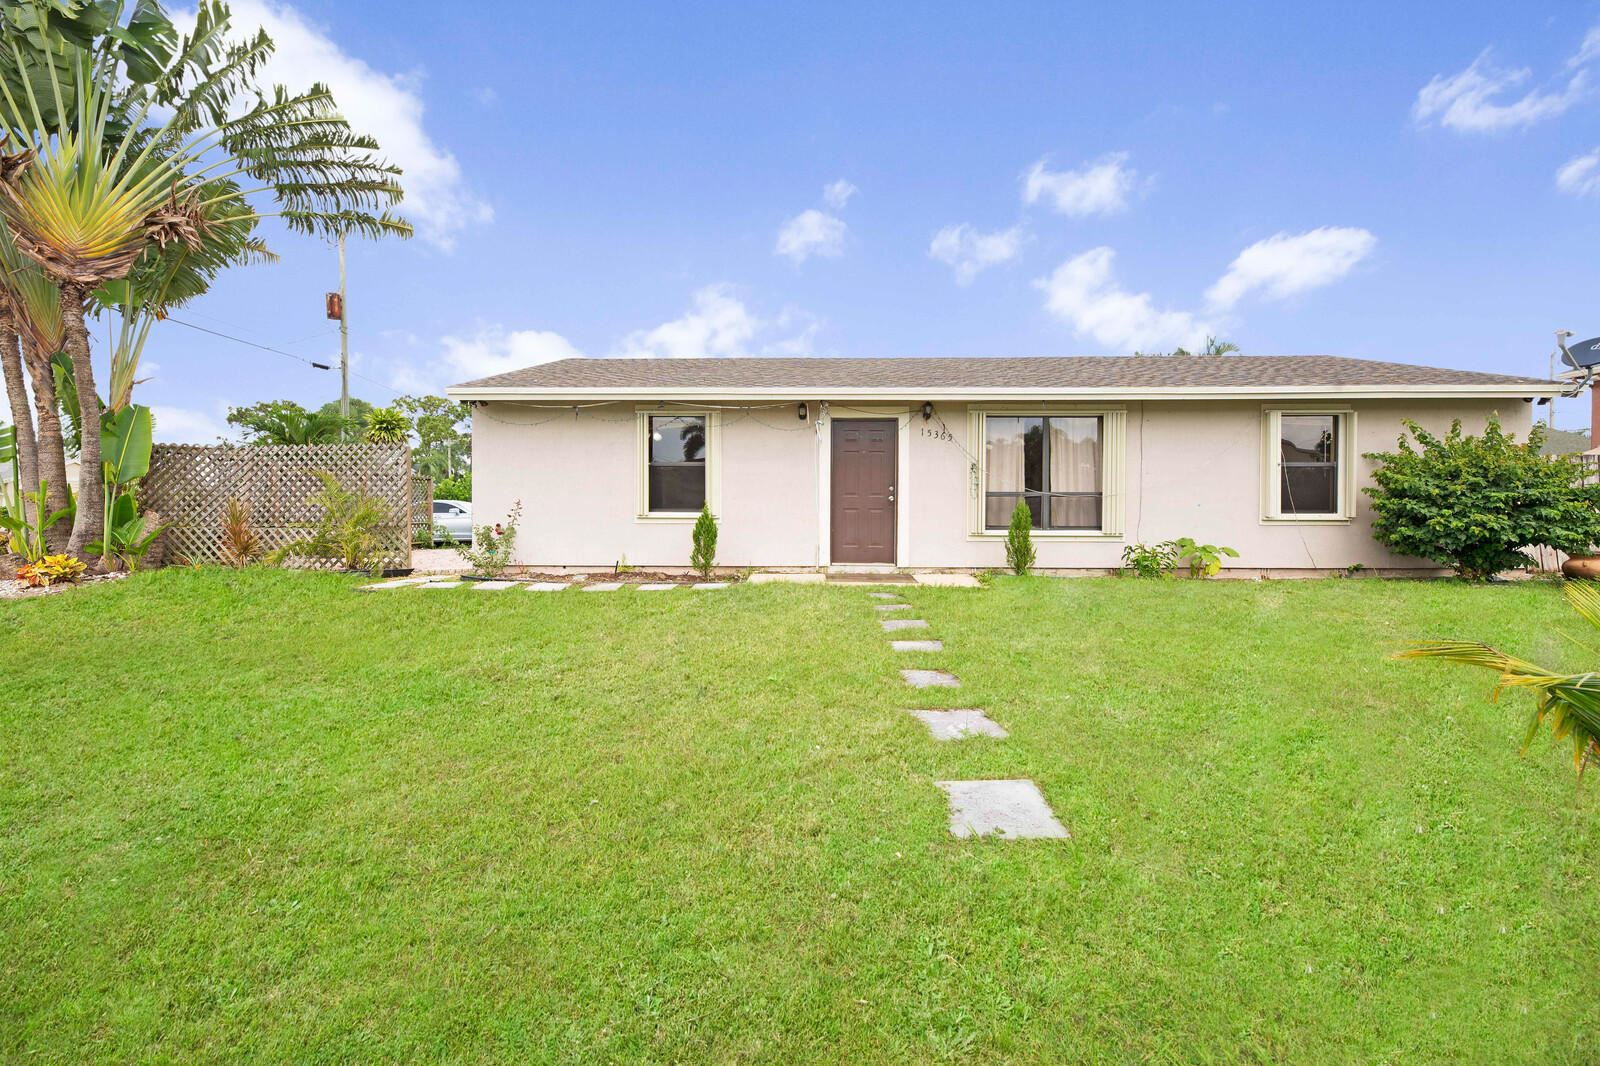 15365 Marrian Avenue, Jupiter, FL 33458 - MLS#: RX-10723869